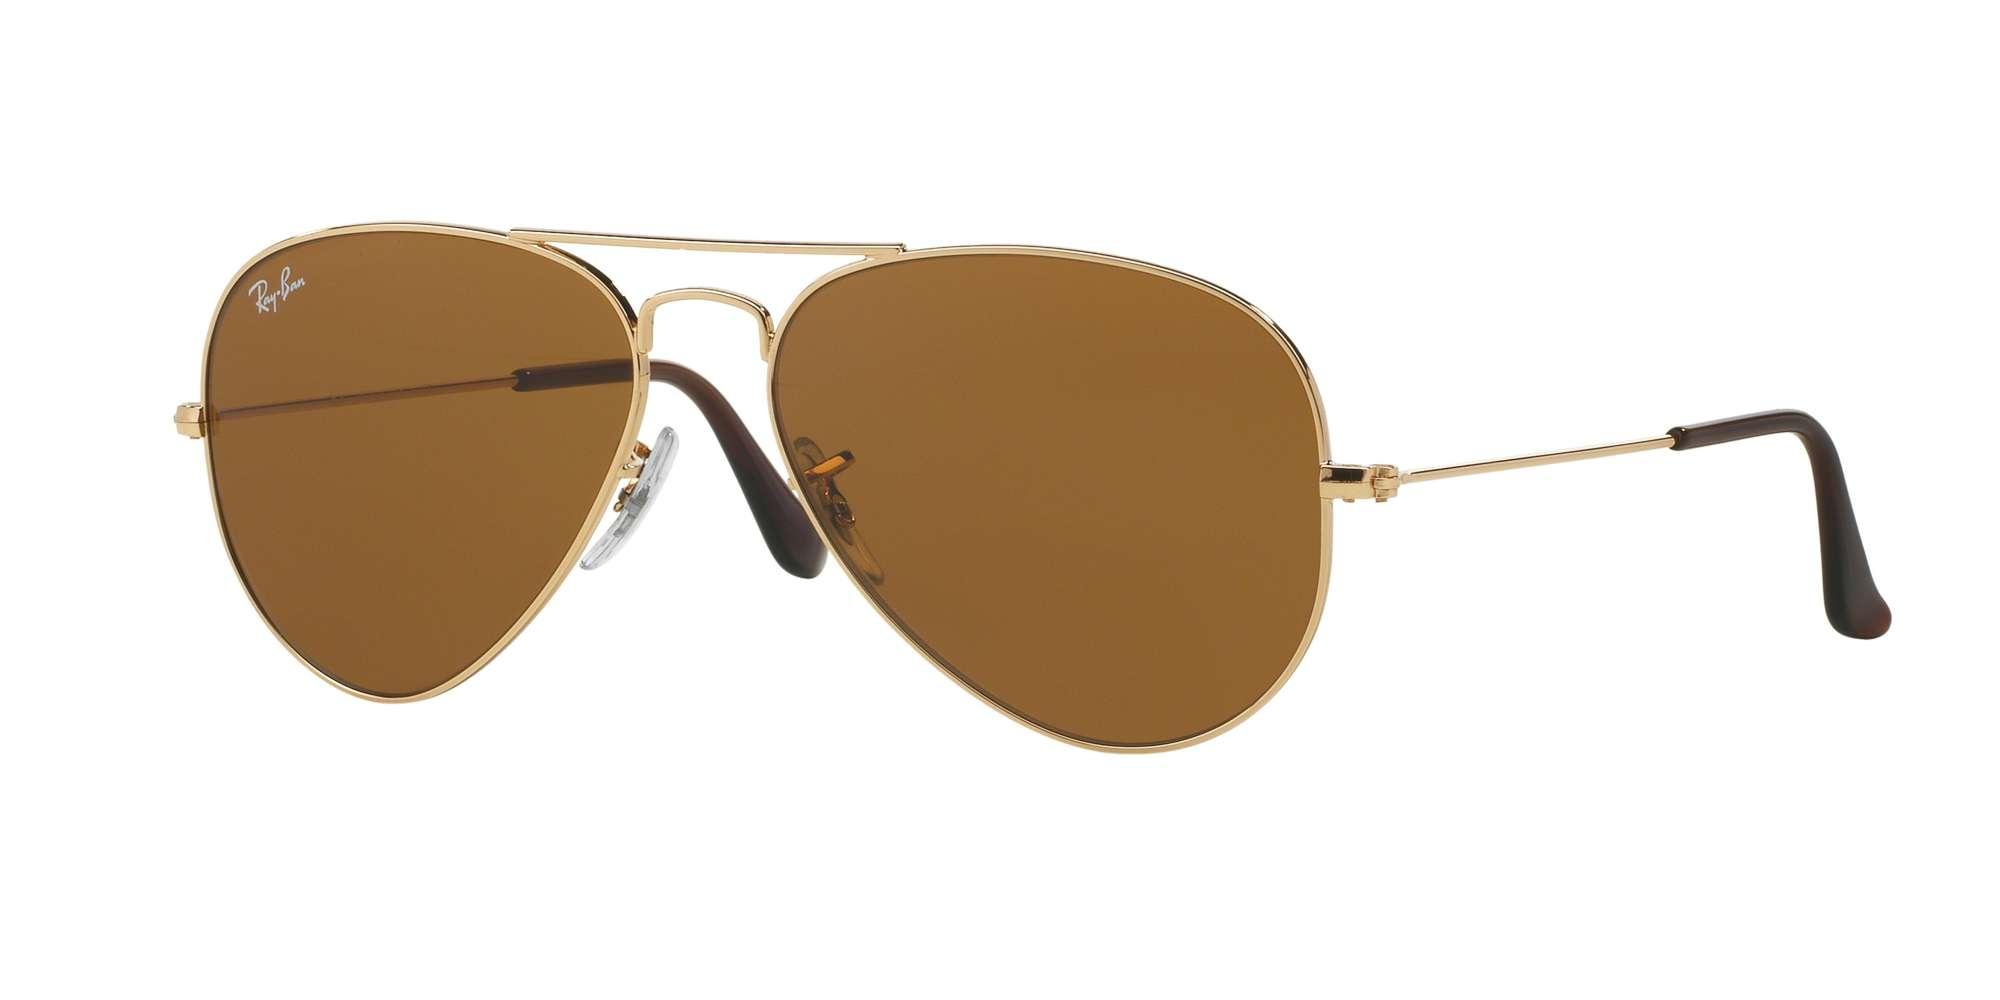 GOLD / CRYSTAL BROWN lenses